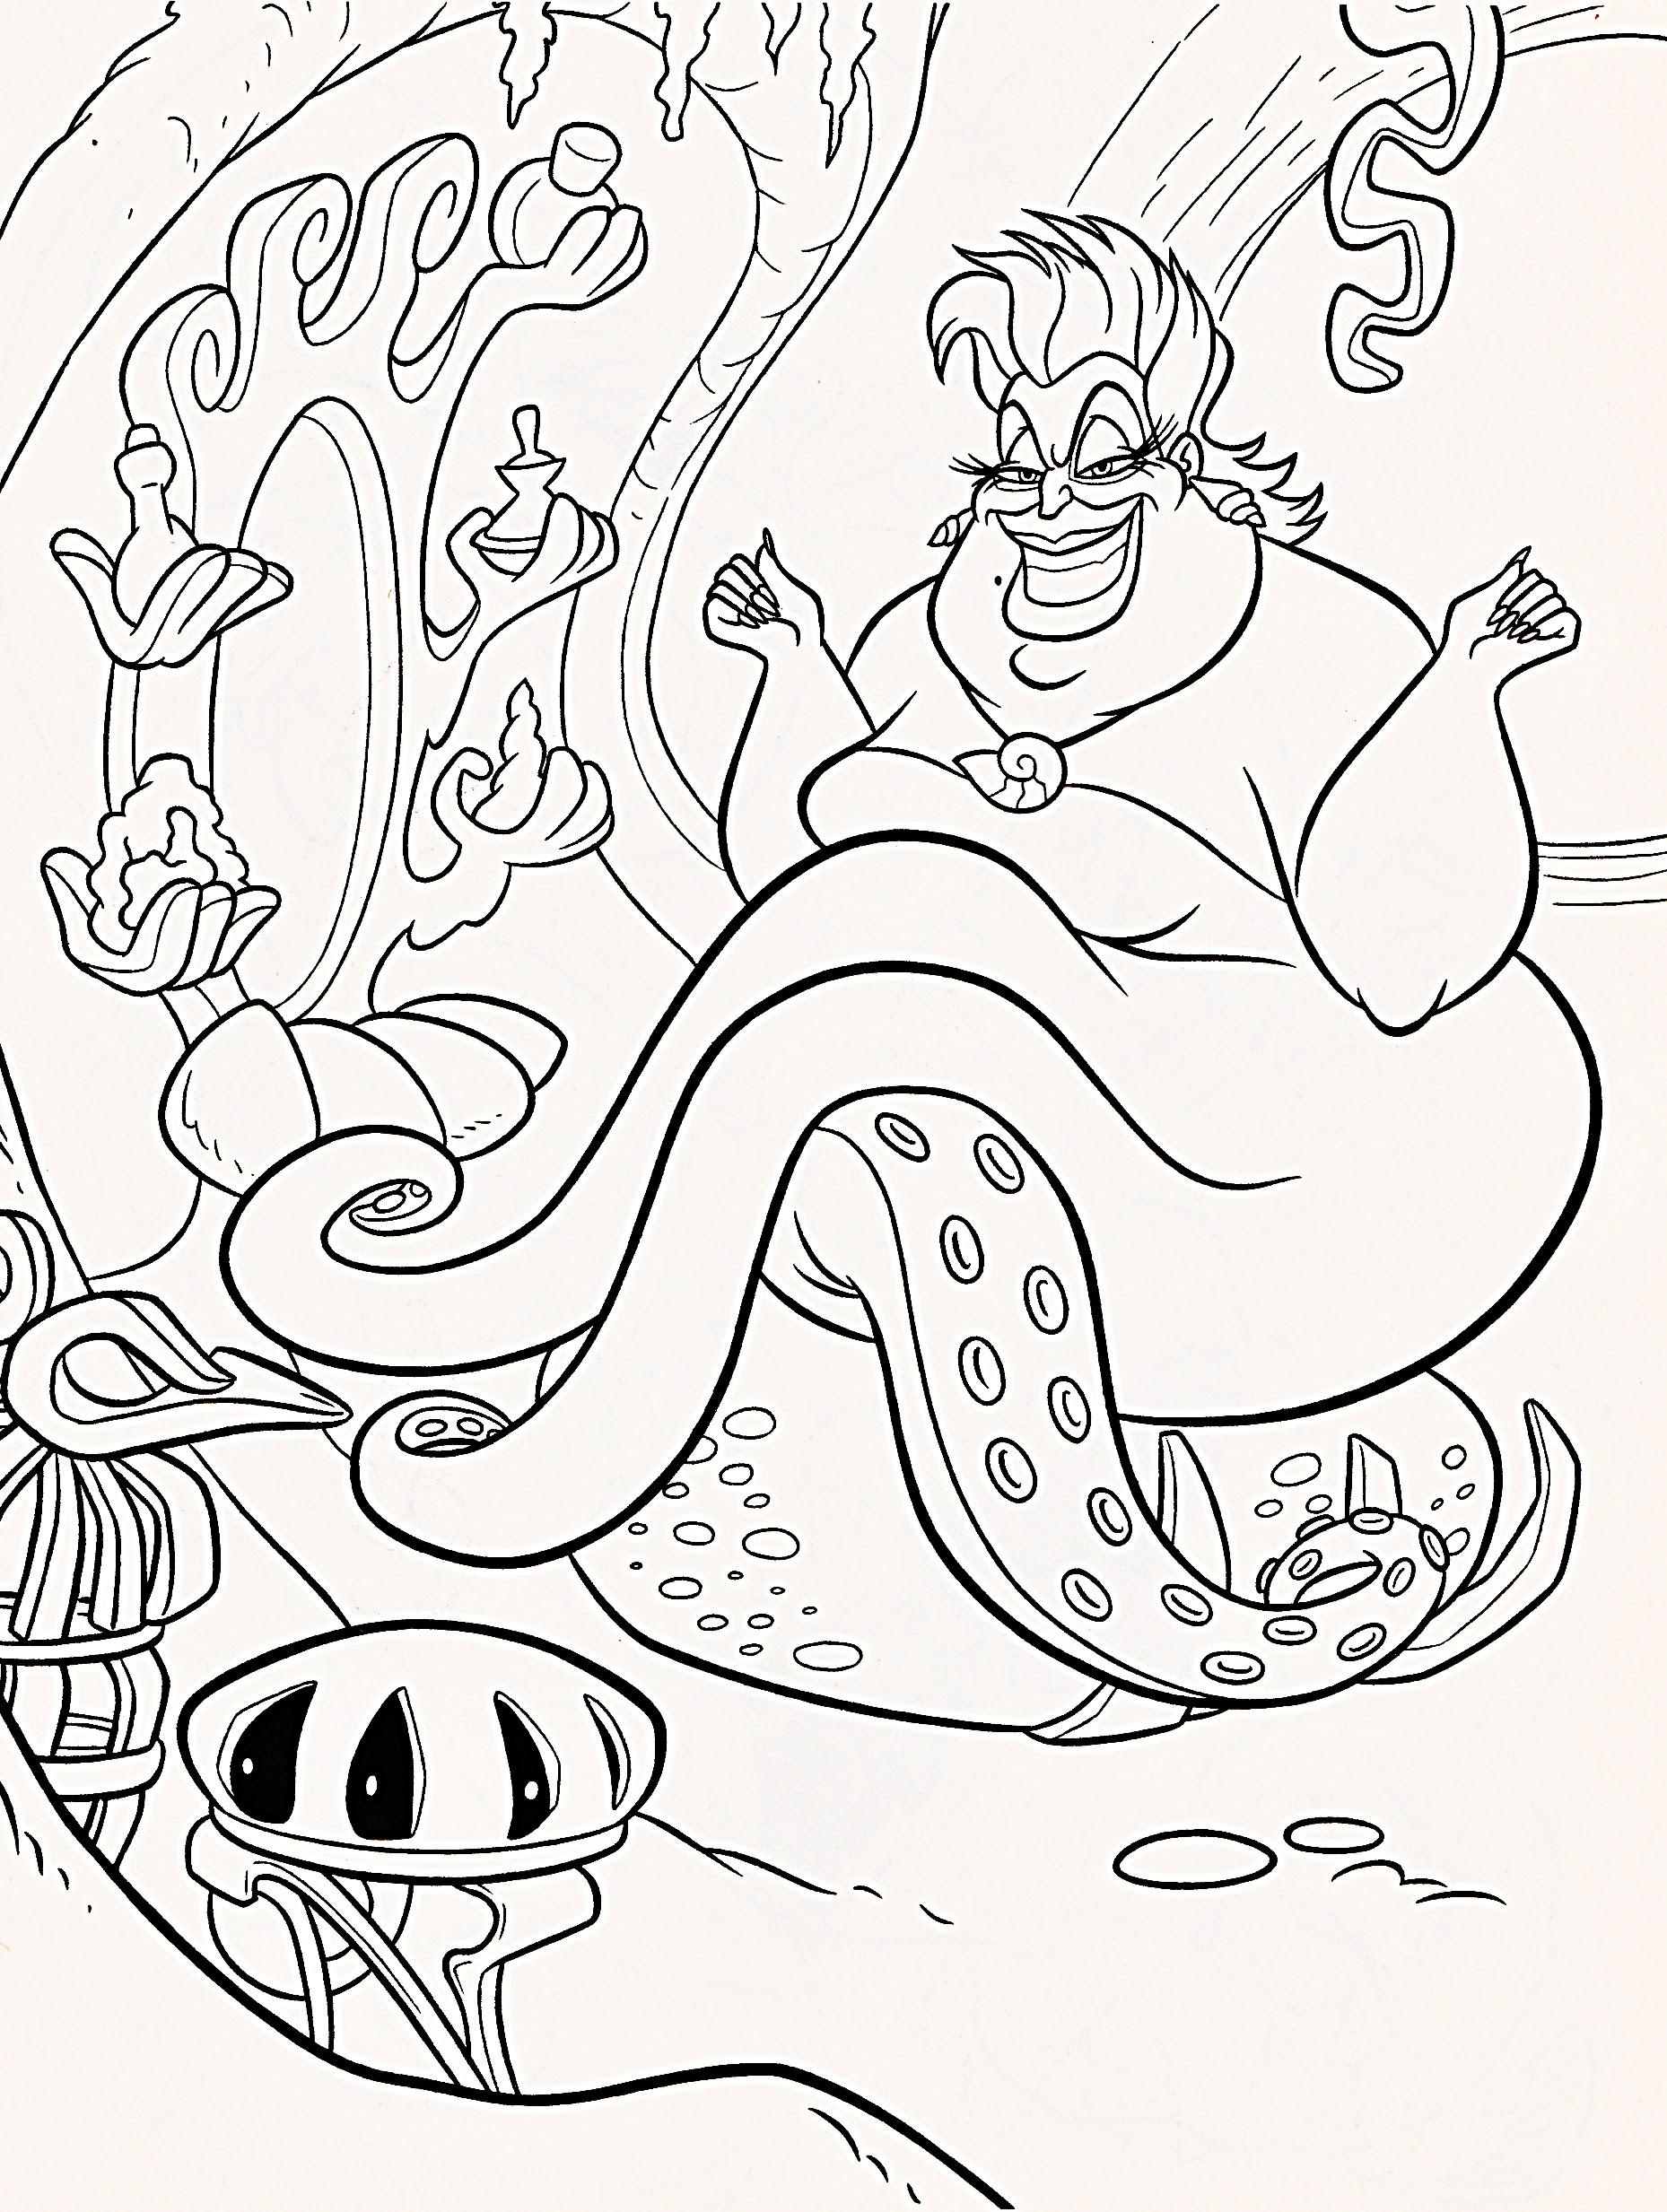 Walt Disney Coloring Pages - Ursula - Walt Disney ...